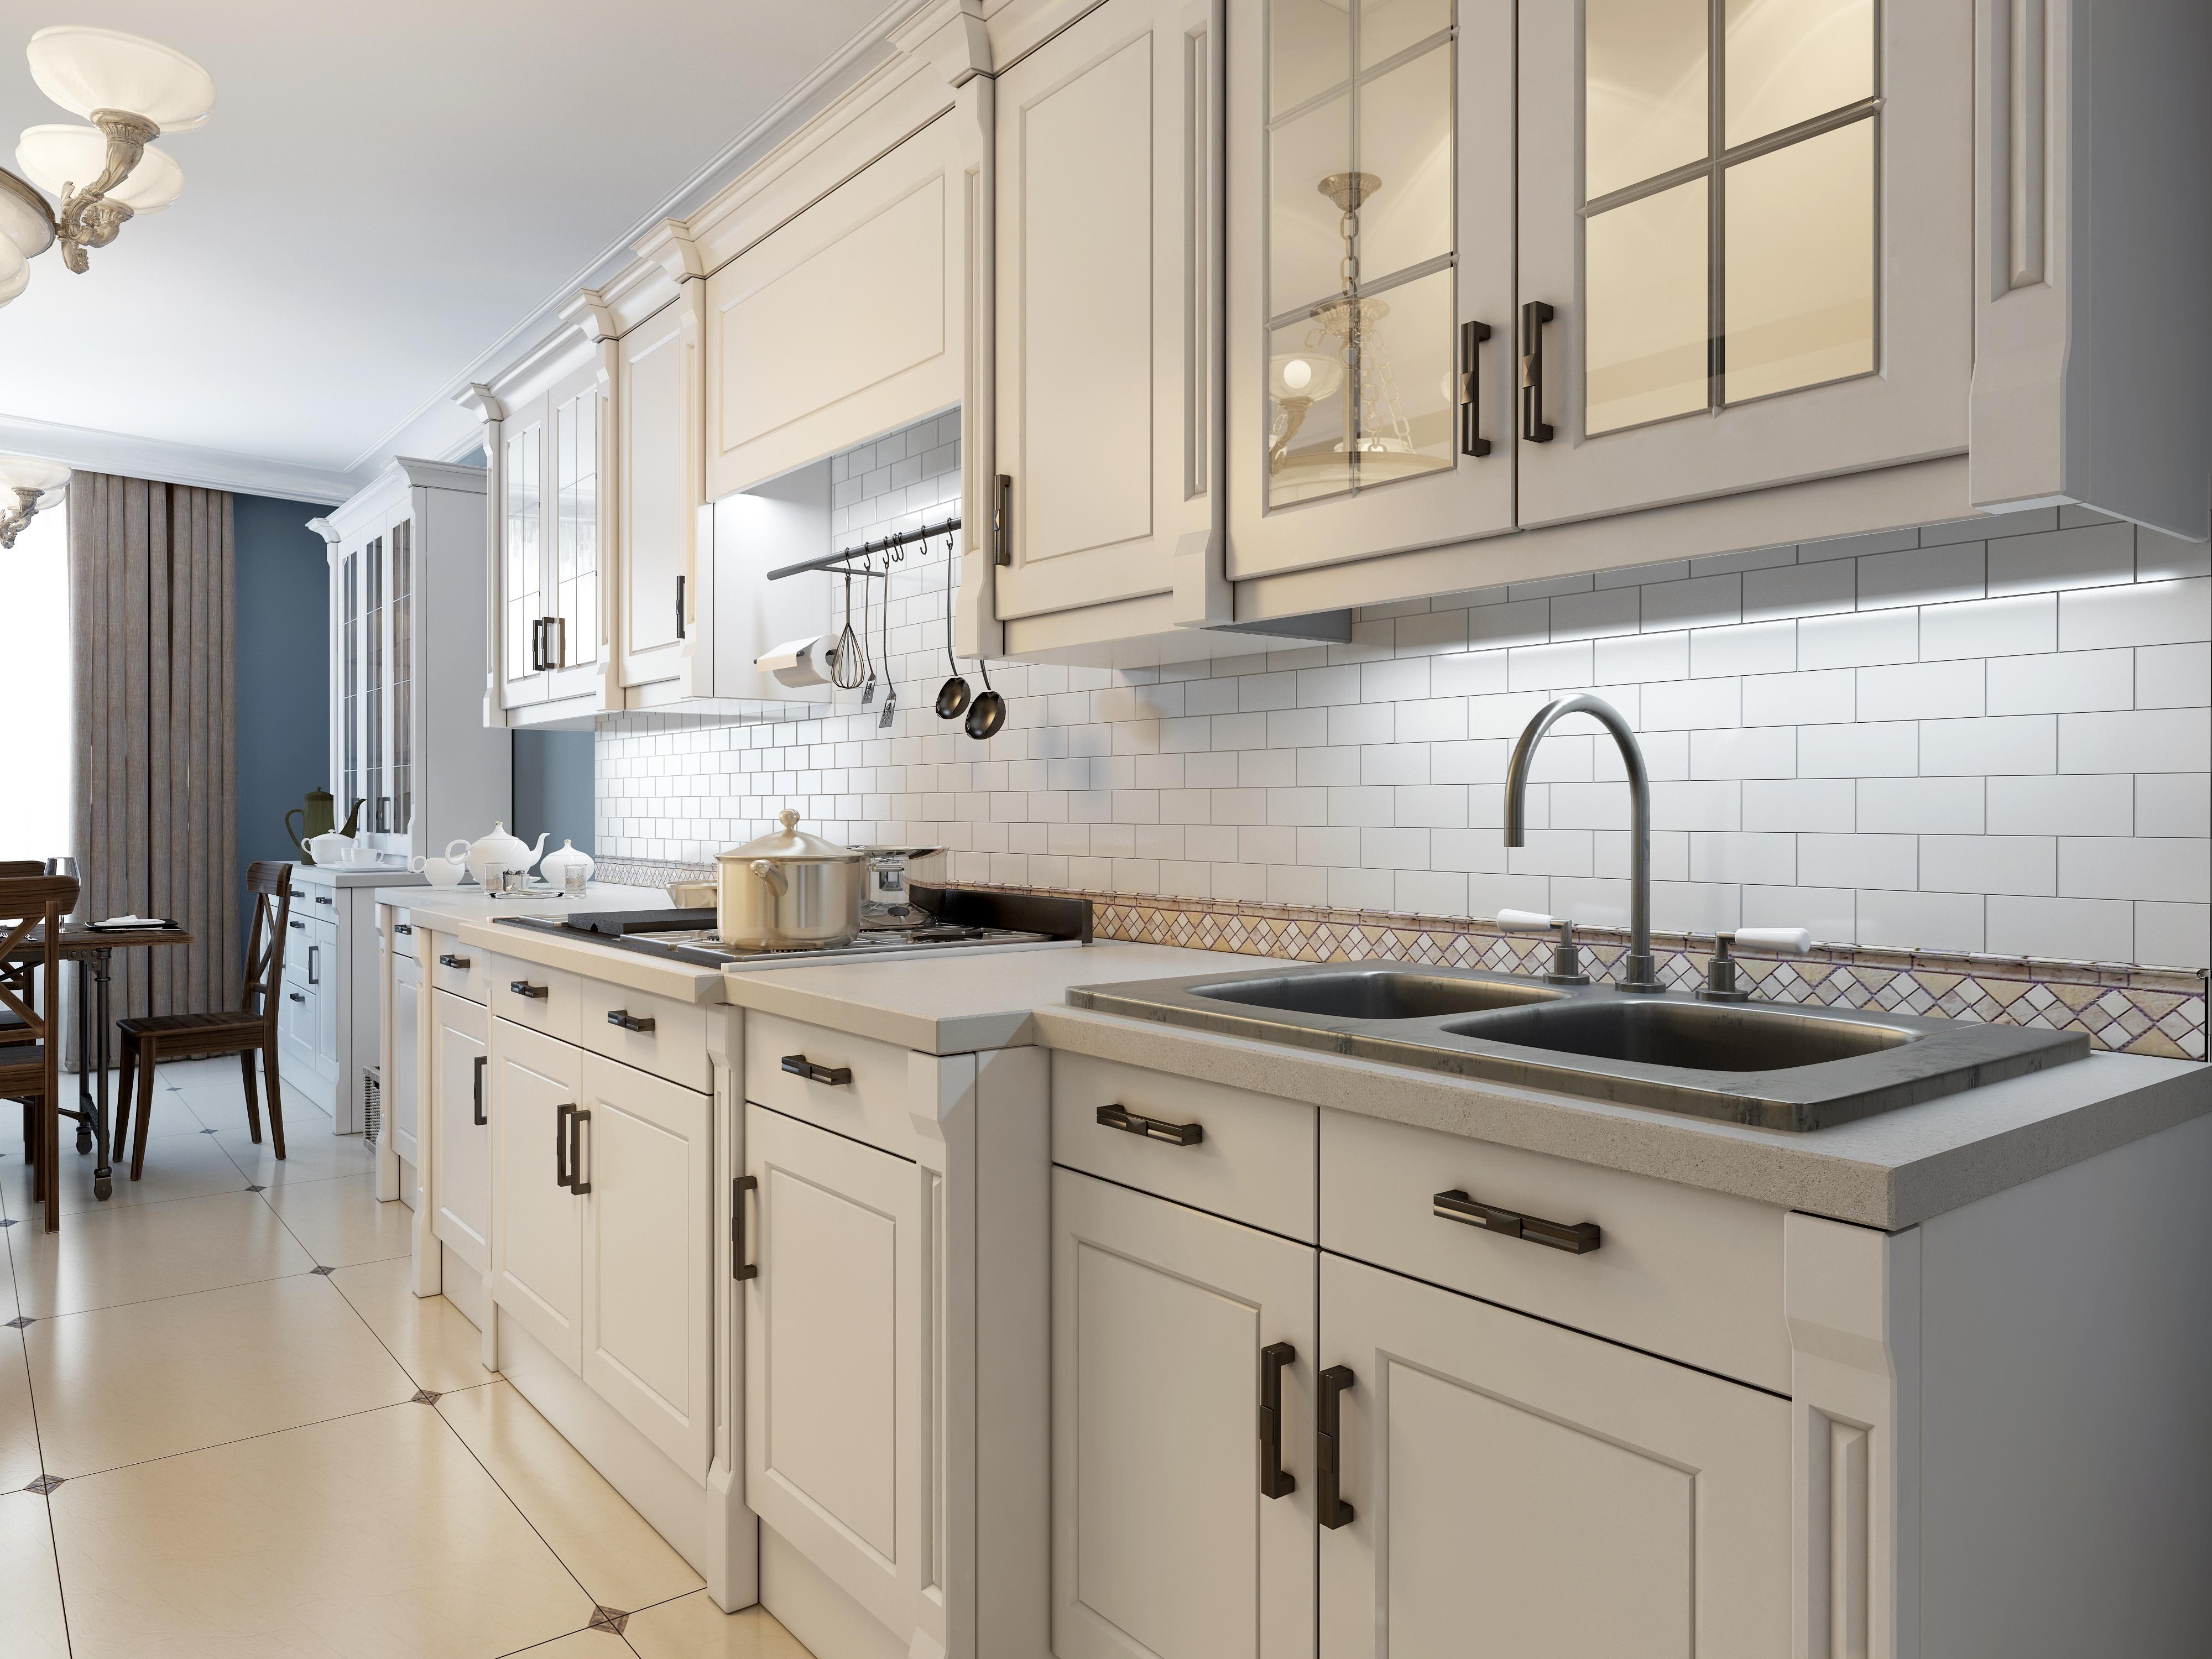 kitchen_DIY_decorating.jpg